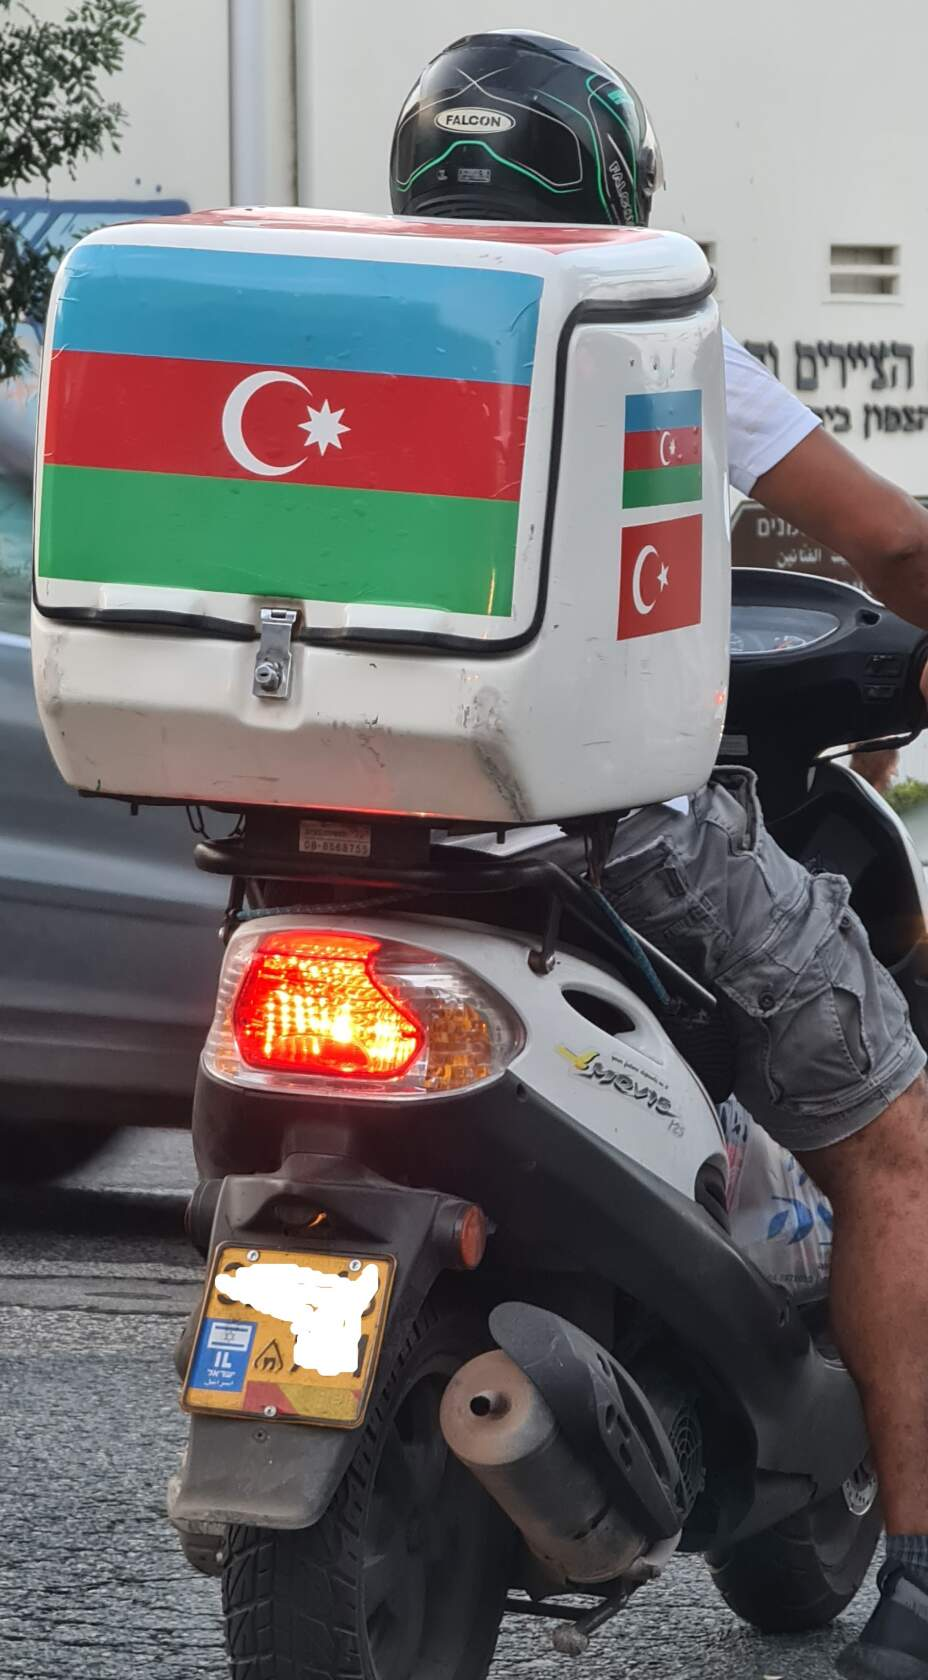 Флаги Азербайджана и Турции на мотороллере в Хайфе